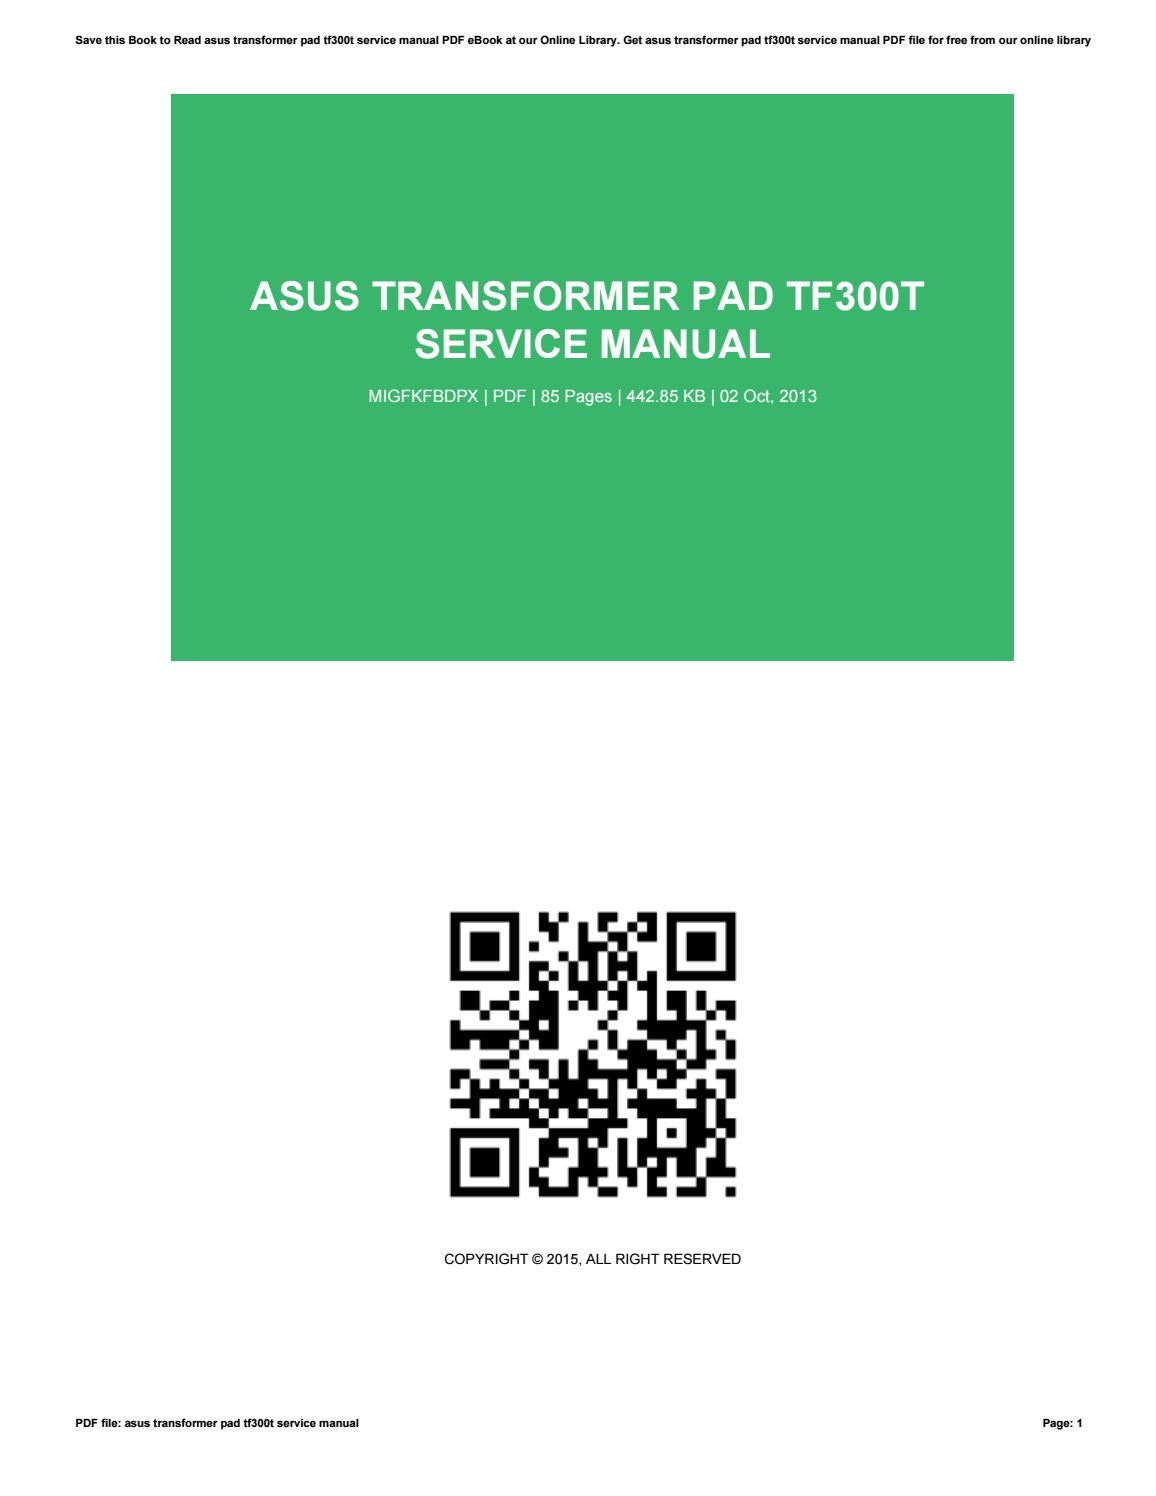 Asus Transformer Pad Tf300t Service Manual By Kimberlyolson3583 Issuu